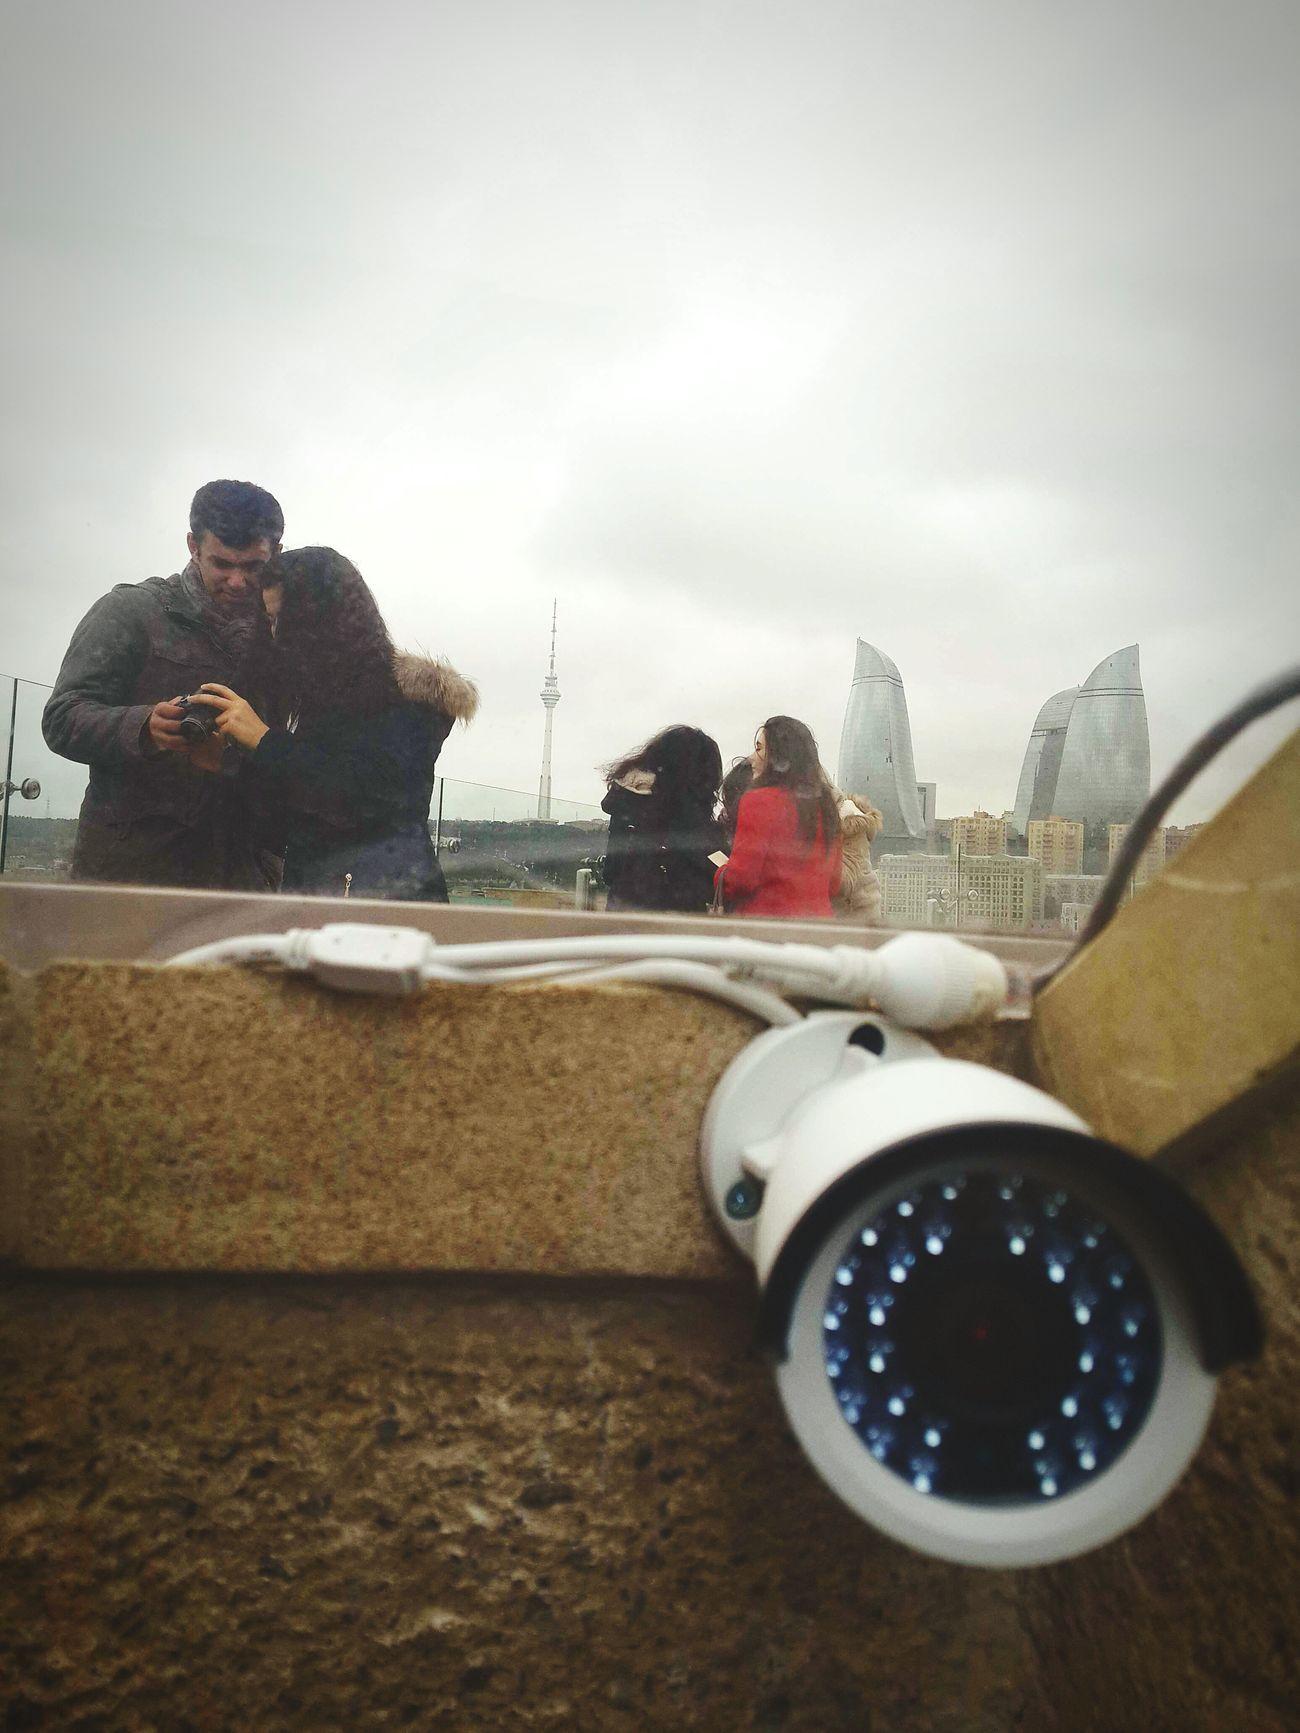 Qiz Qalasi Securitycam People Photography Baku Azerbaijan